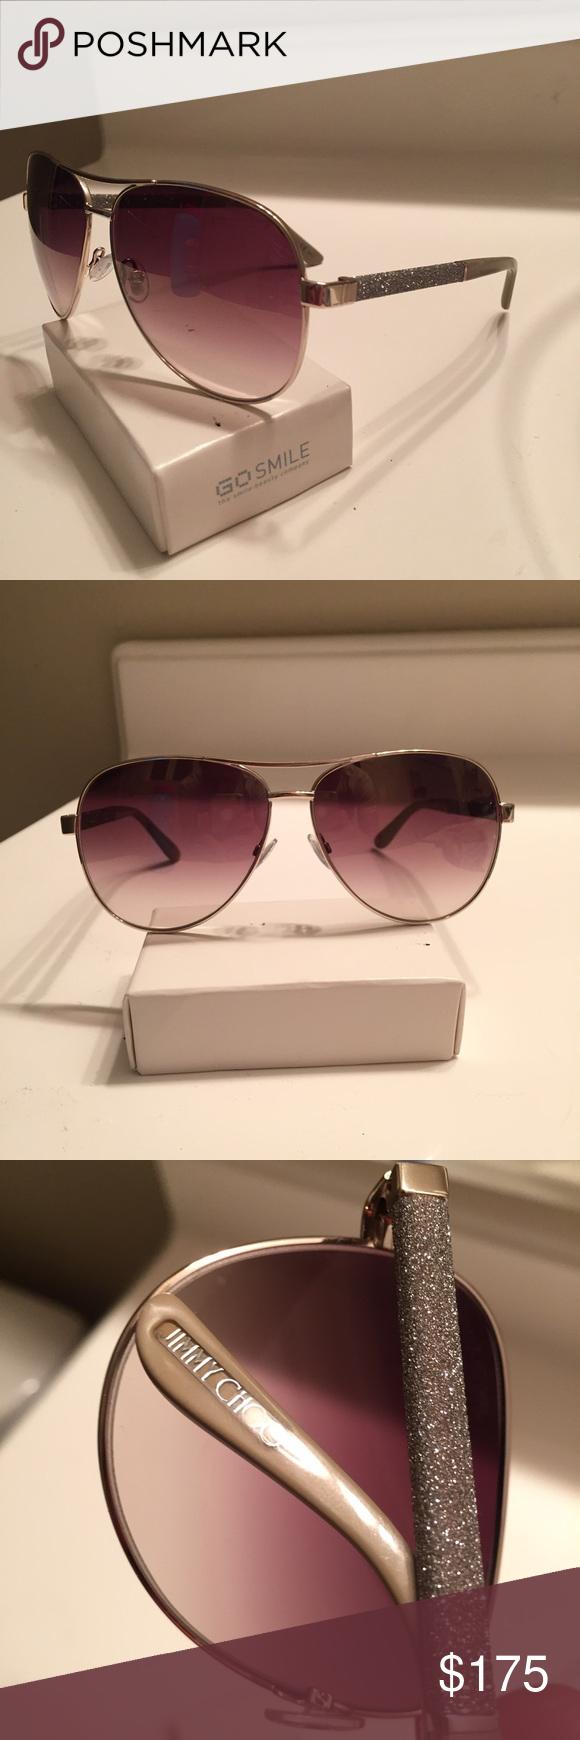 32bdca02cd6 Jimmy Choo Lexie women s aviator sunglasses Store display Jimmy Choo  aviator sunglasses in like new condition. No jimmy Choo case but a hard  case will be ...